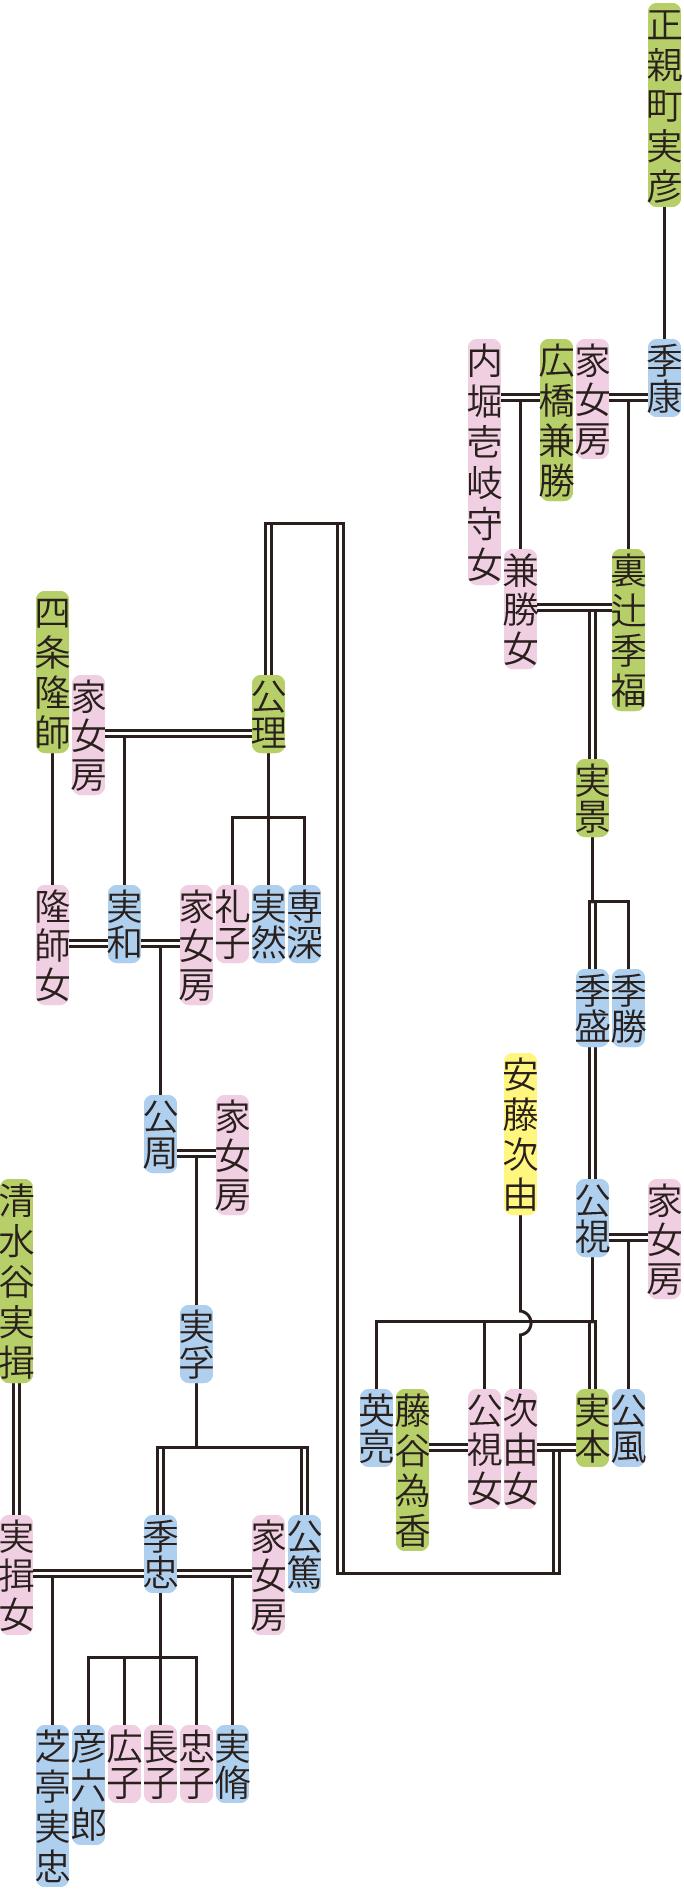 裏辻季福~実脩の系図